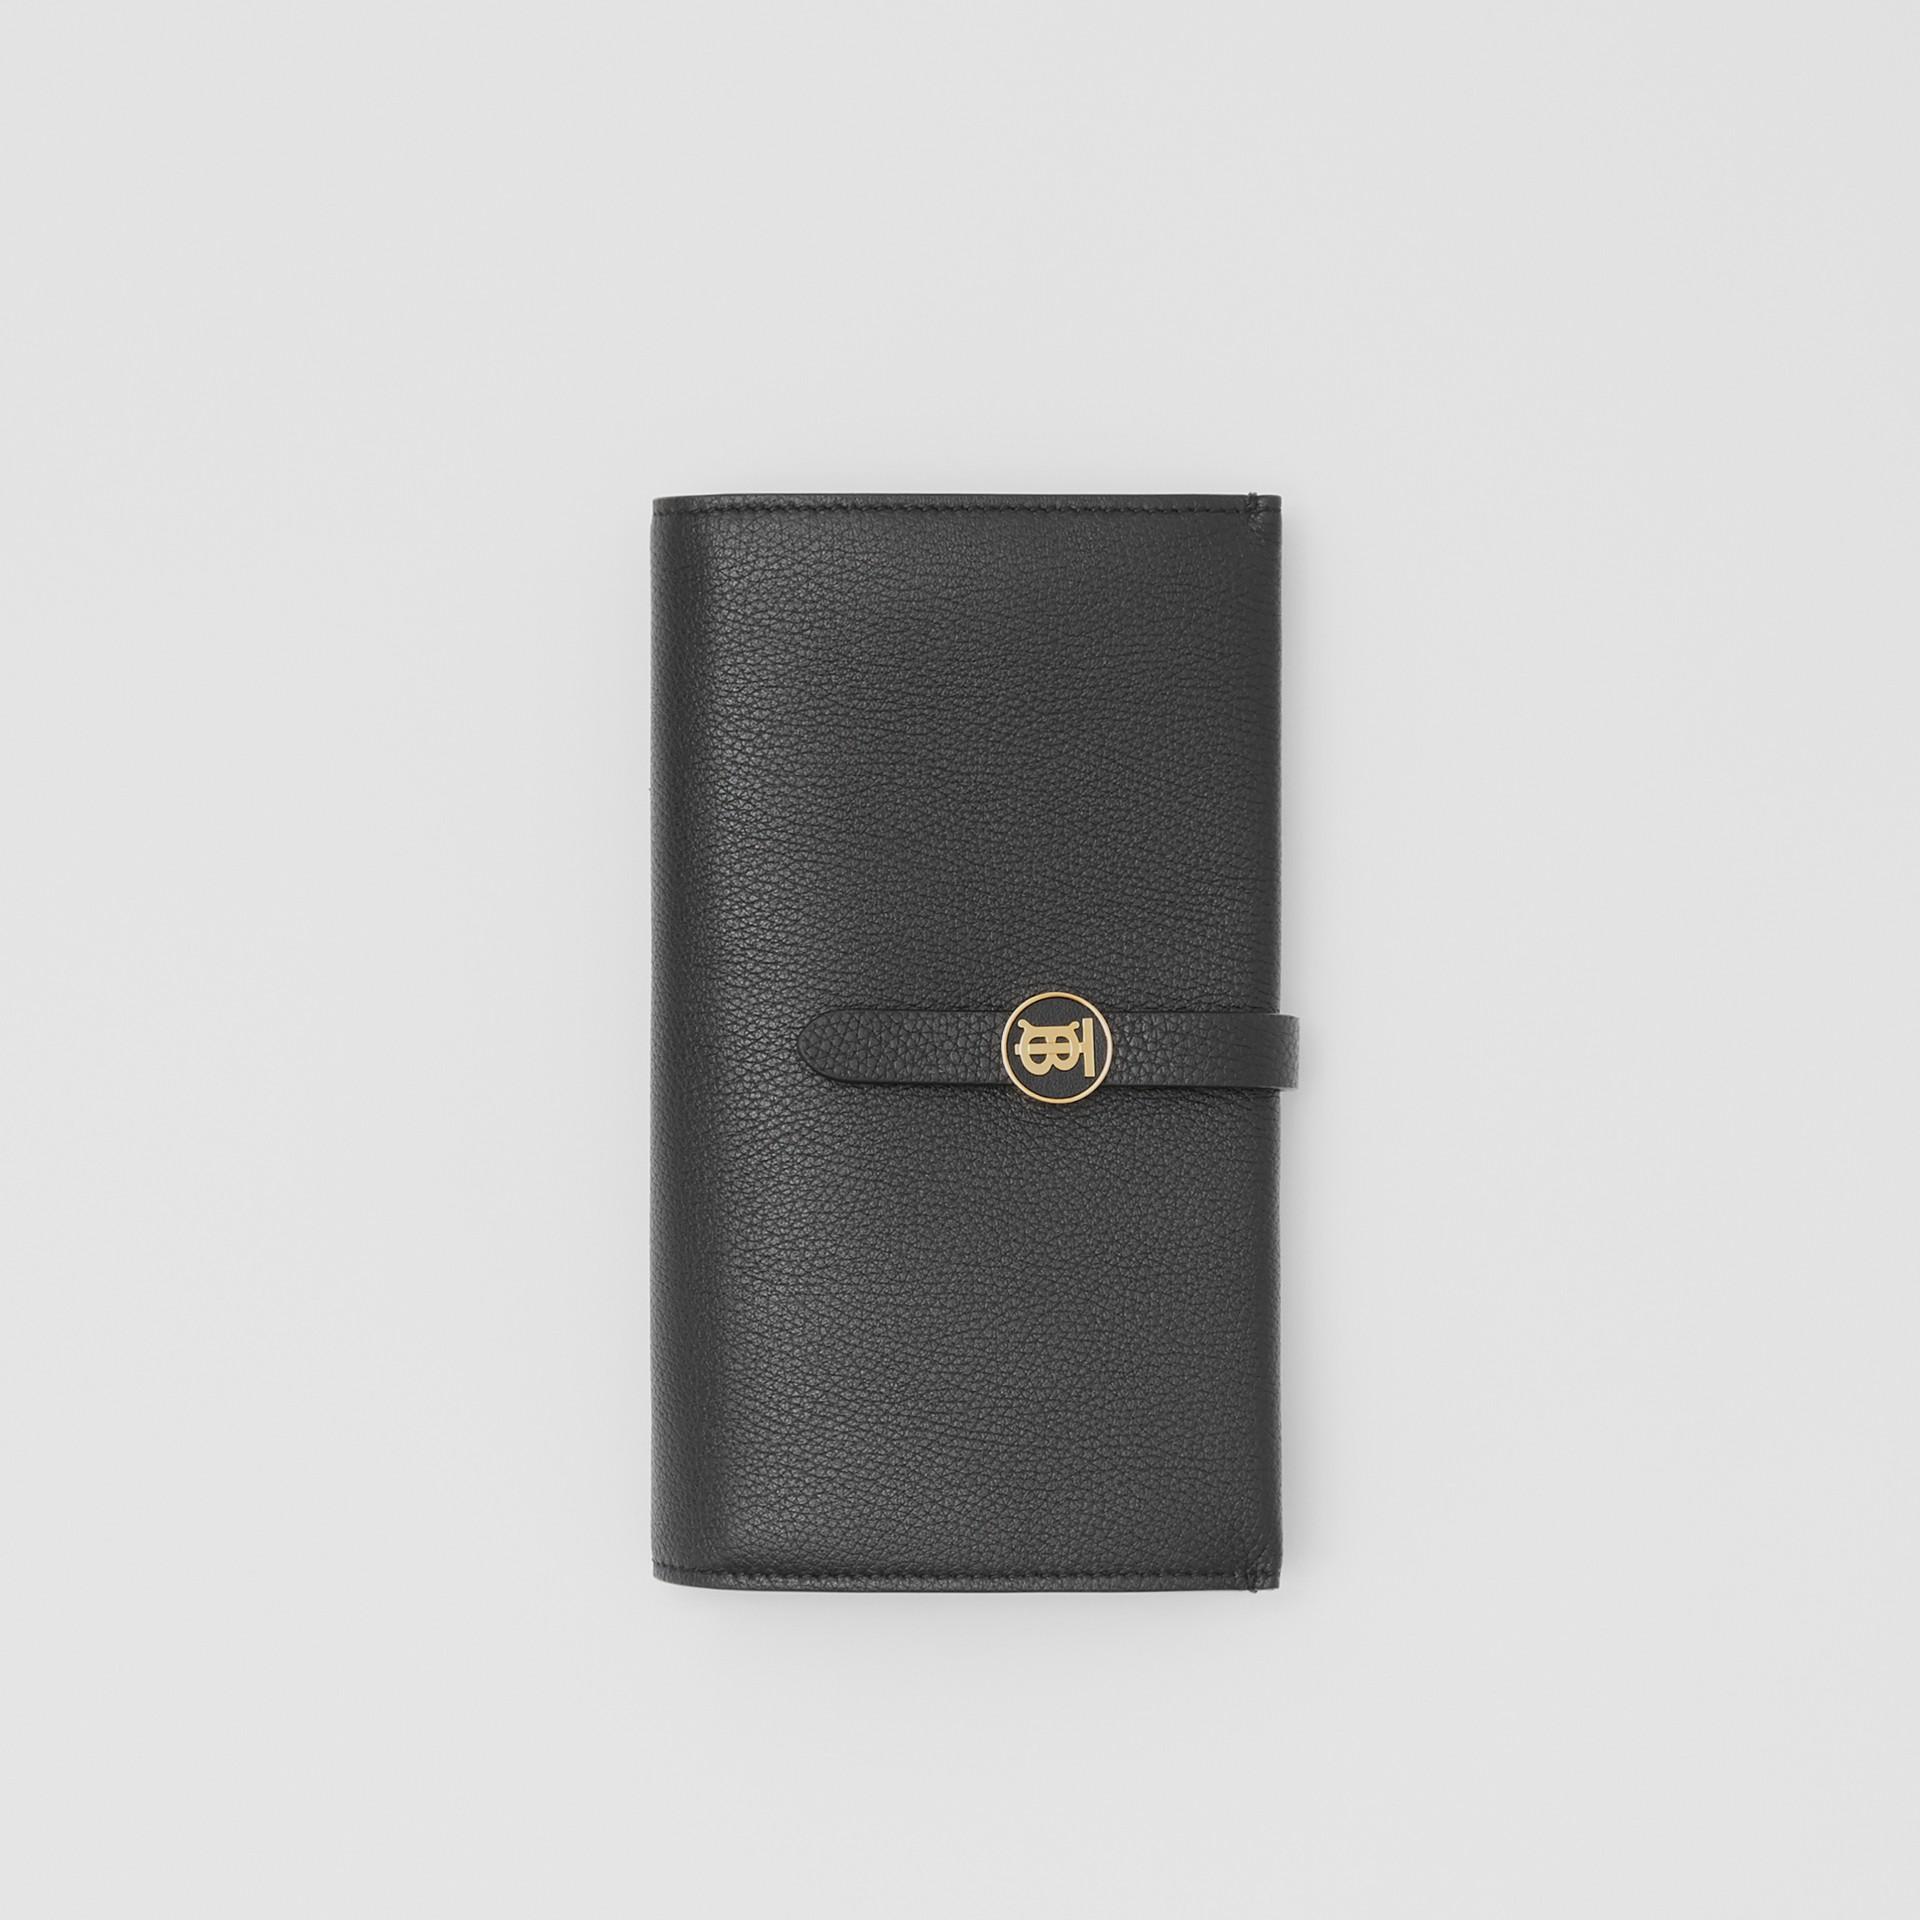 Monogram Motif Grainy Leather Folding Wallet in Black - Women | Burberry - gallery image 0